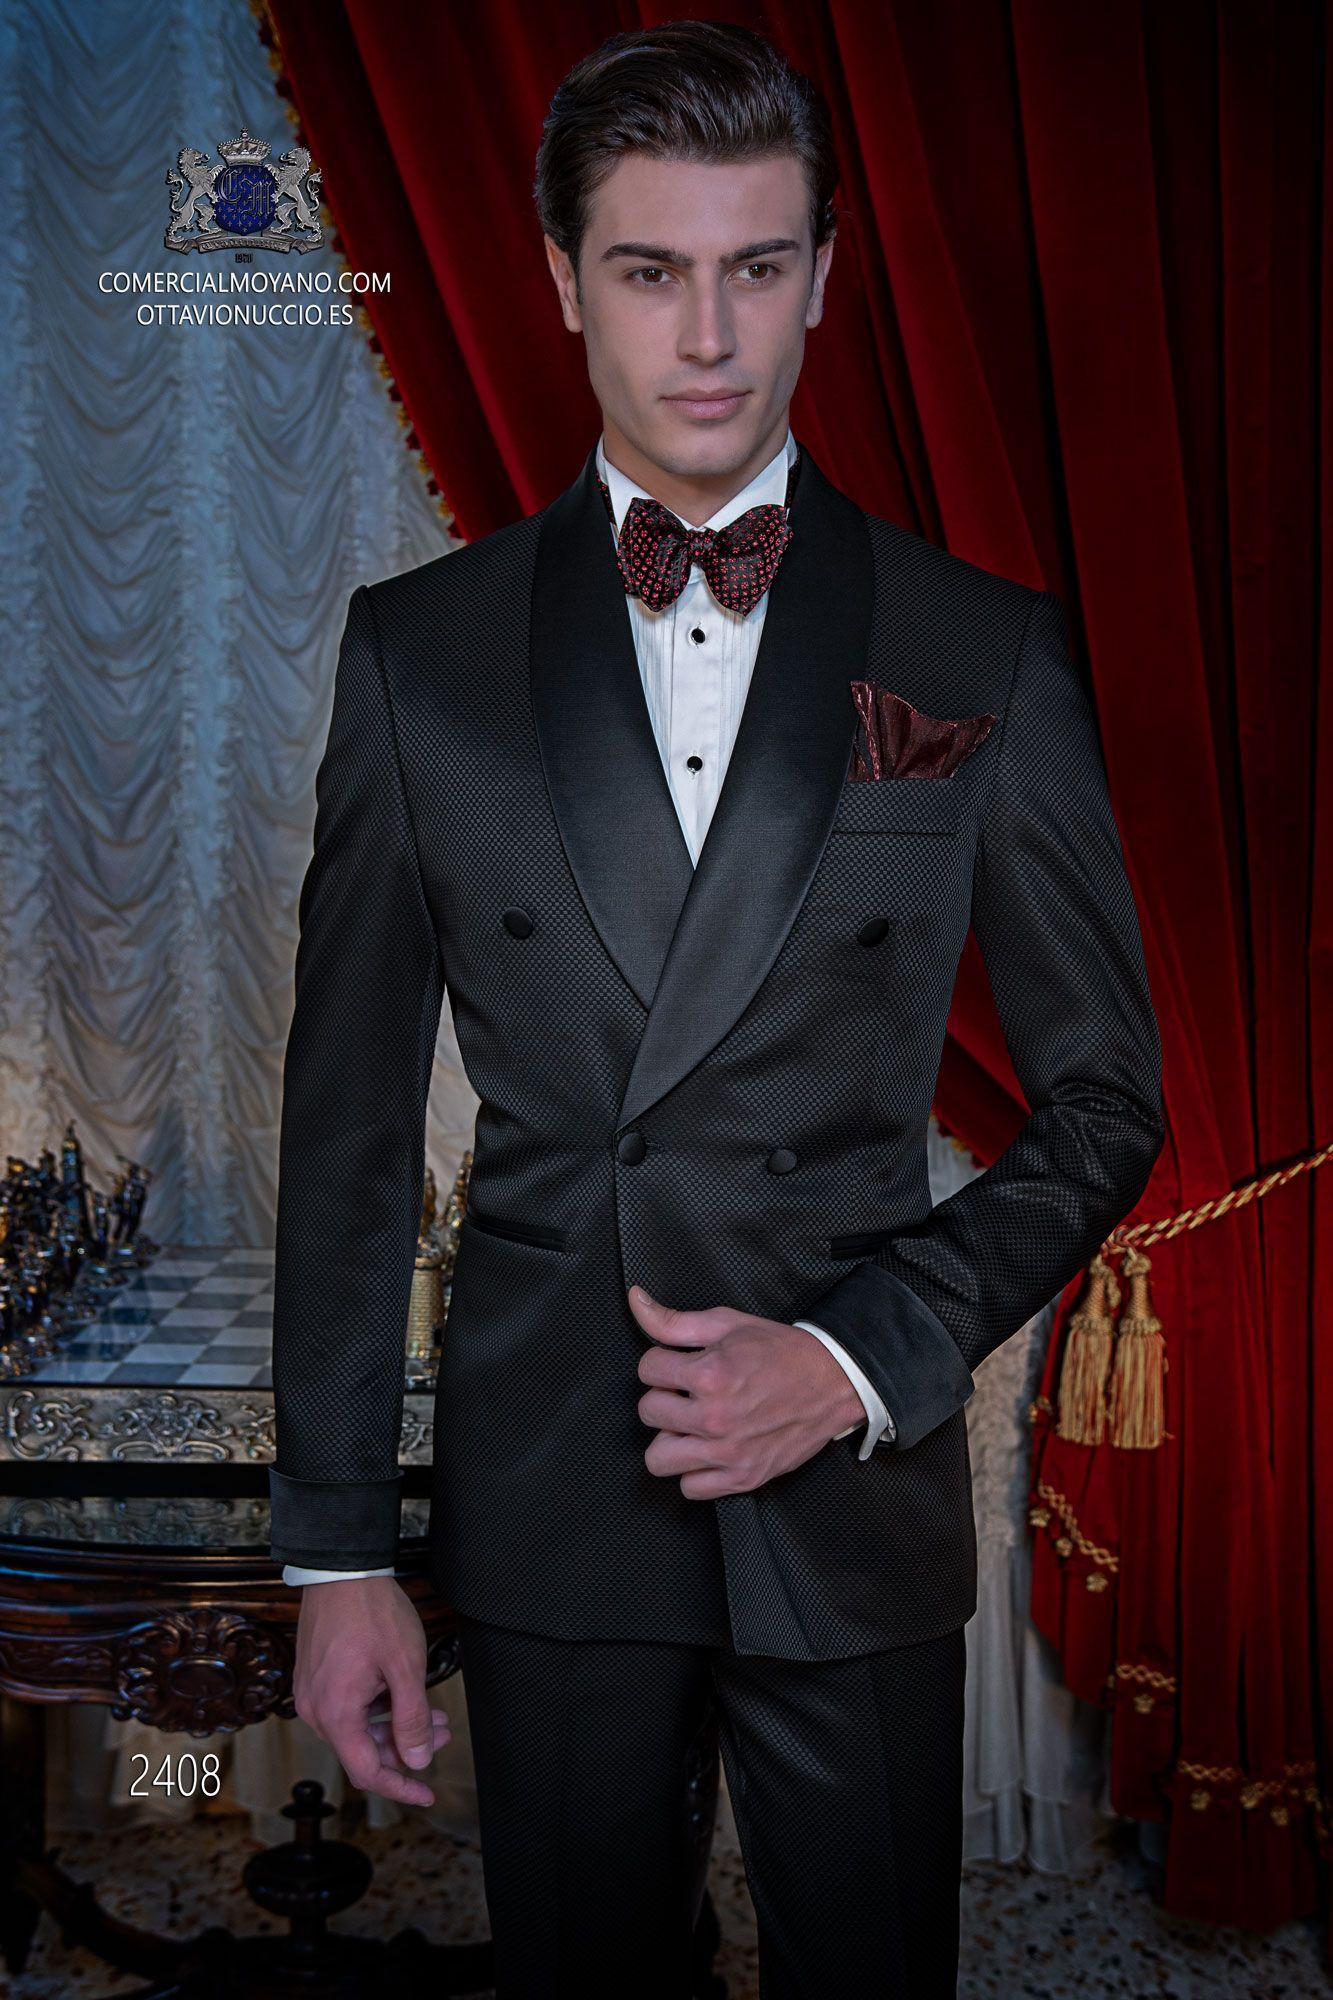 Italian double breasted black tuxedo with satin lapels ...